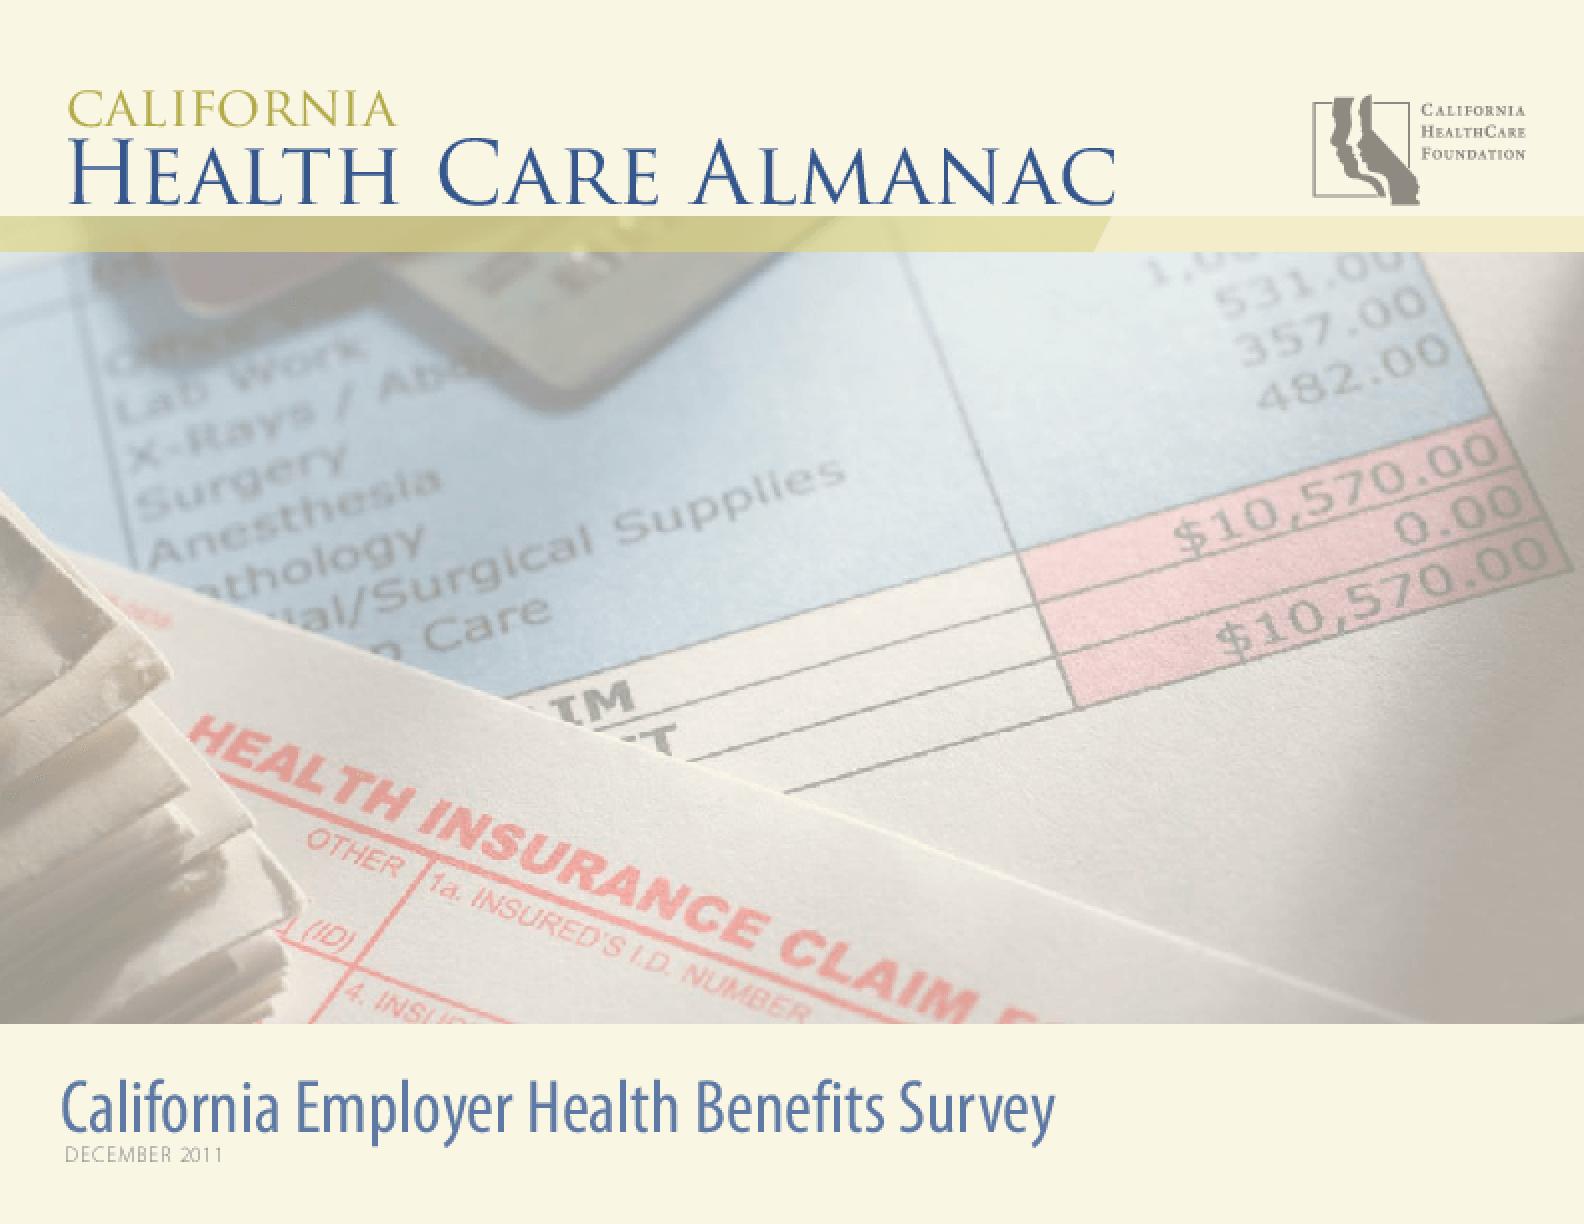 California Employer Health Benefits Survey 2011